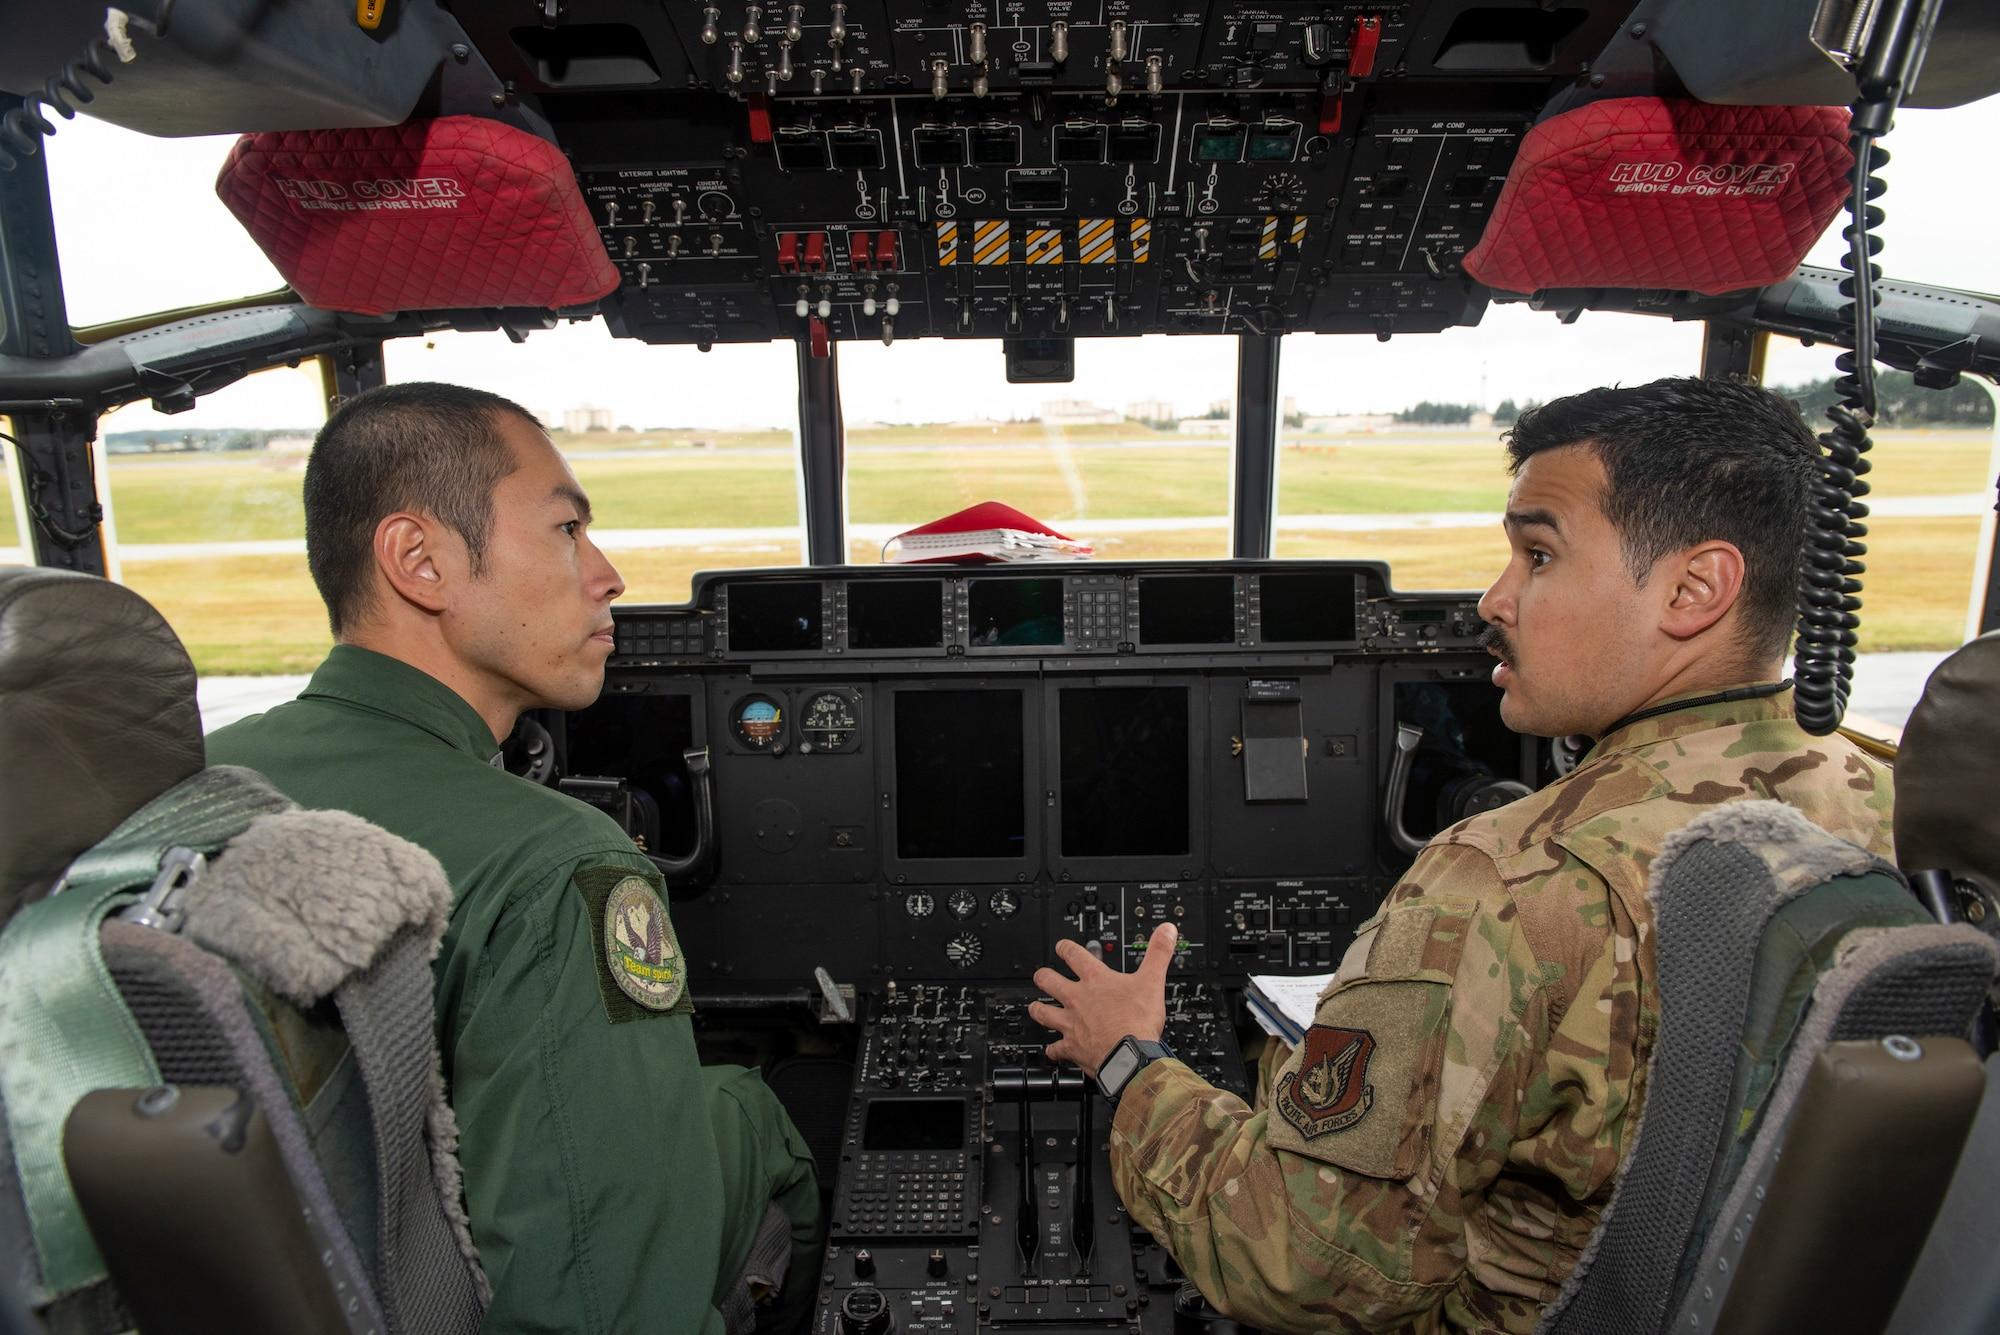 Staff Sgt. Hector Frietze, 36th Airlift Squadron loadmaster, explains how they perform pre-flight inspections inside a C-130J Super Hercules to Koku-Jieitai Tech. Sgt. Hideki Tanaka, 403rd Tactical Airlift Squadron loadmaster assigned with Miho Air Base, Japan, Oct. 22, 2019, at Yokota Air Base.